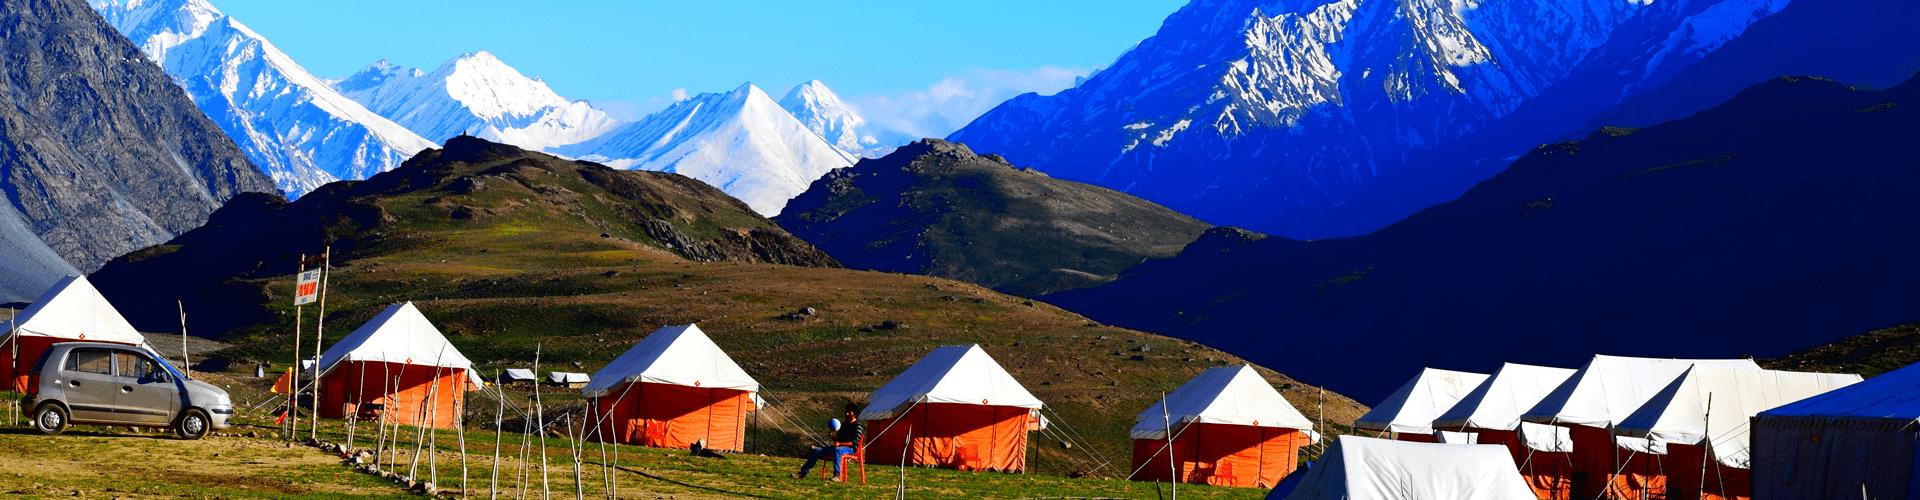 Tenzin Camps ChandraTal